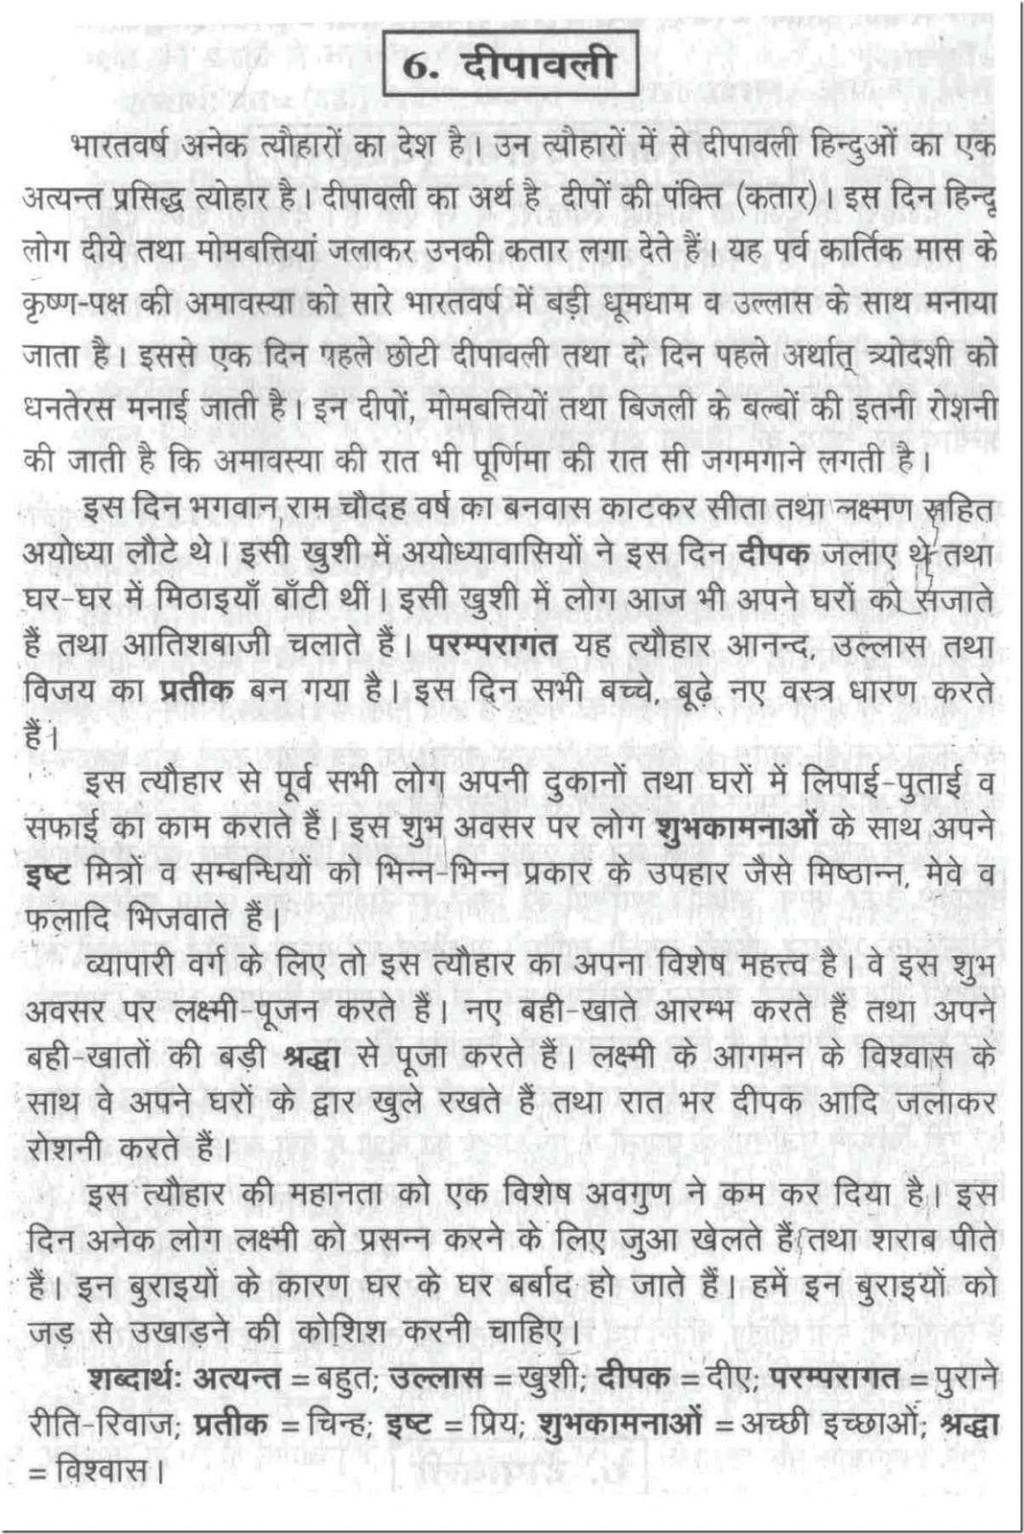 004 2bdiwali2bfestival2bessay2bin2bhindi2b2b252812529 Essay For Diwali In Hindi Fantastic On 50 Words Class Short 3 Large